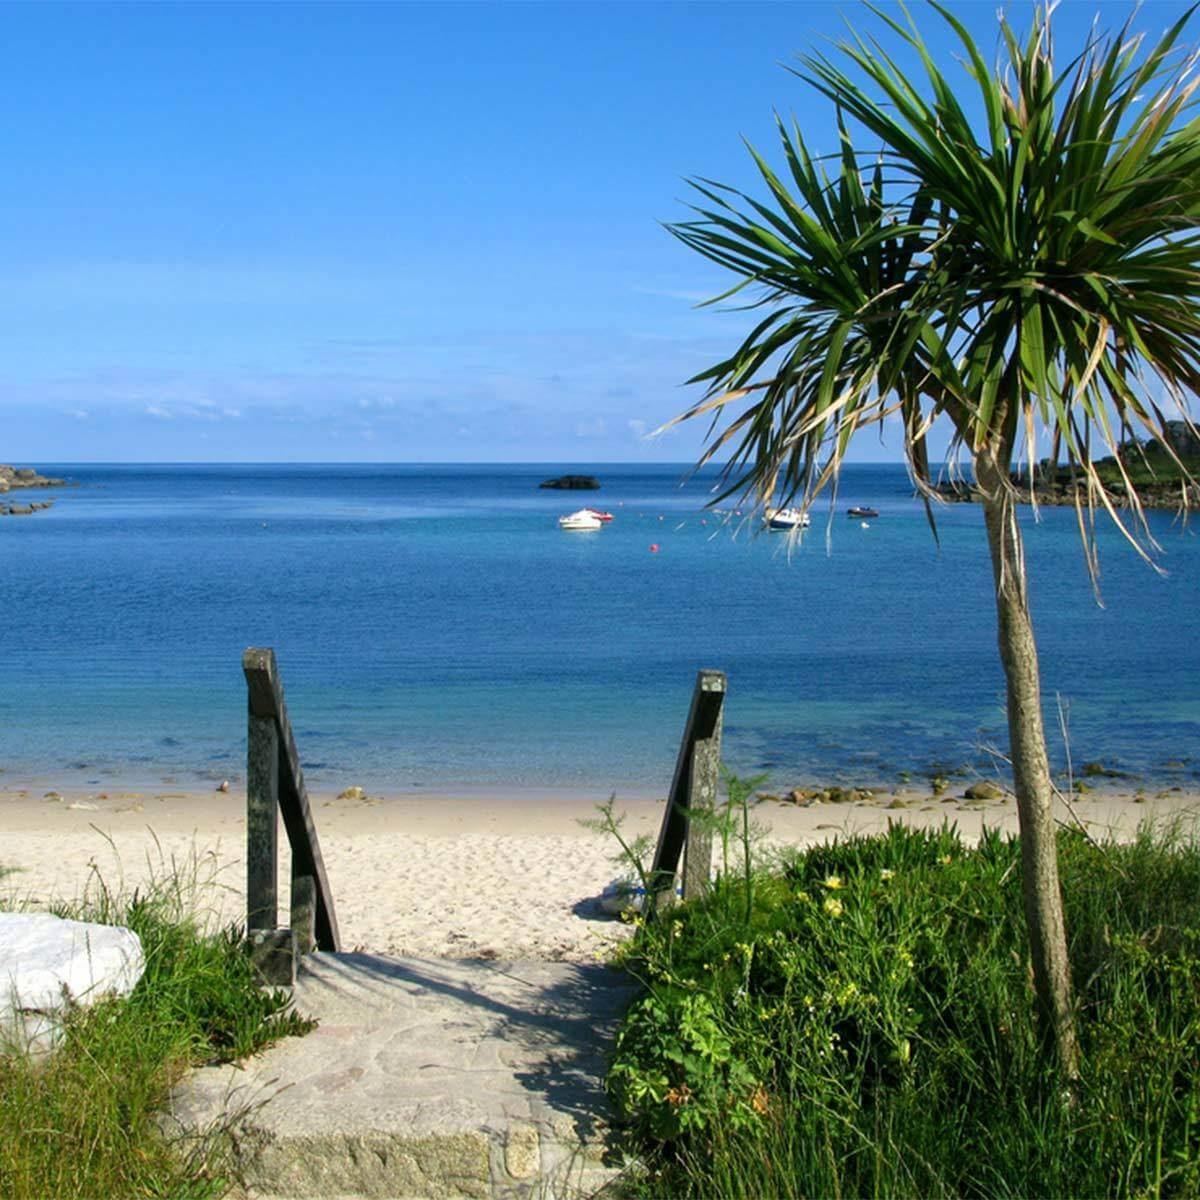 Tamarisk and Llewynywermod Royal Beaches vacation tropical